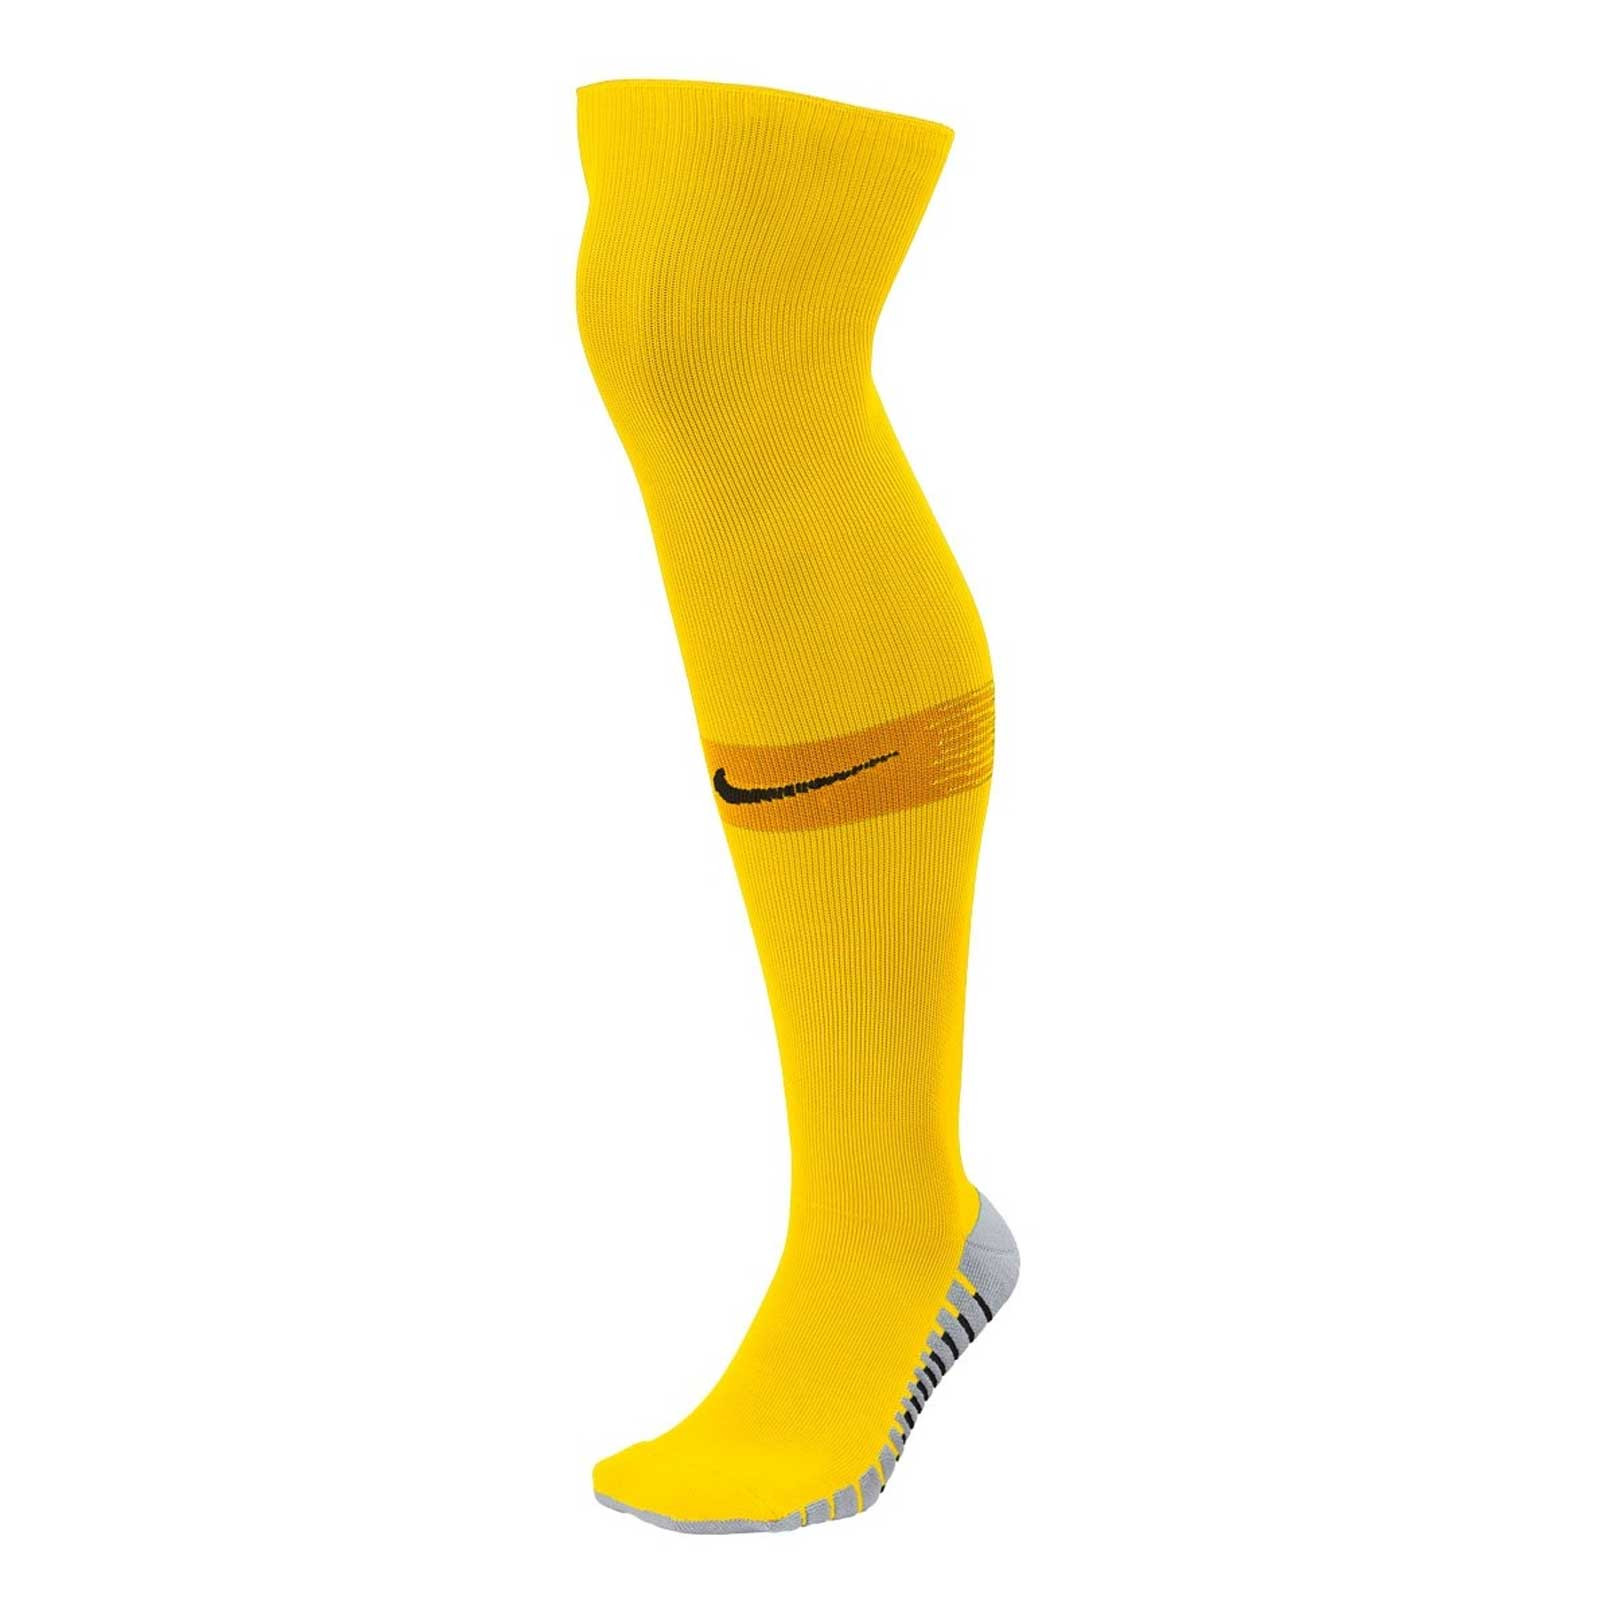 sobresalir Realizable Matrona  Medias Nike Matchfit OTC amarillas | futbolmania